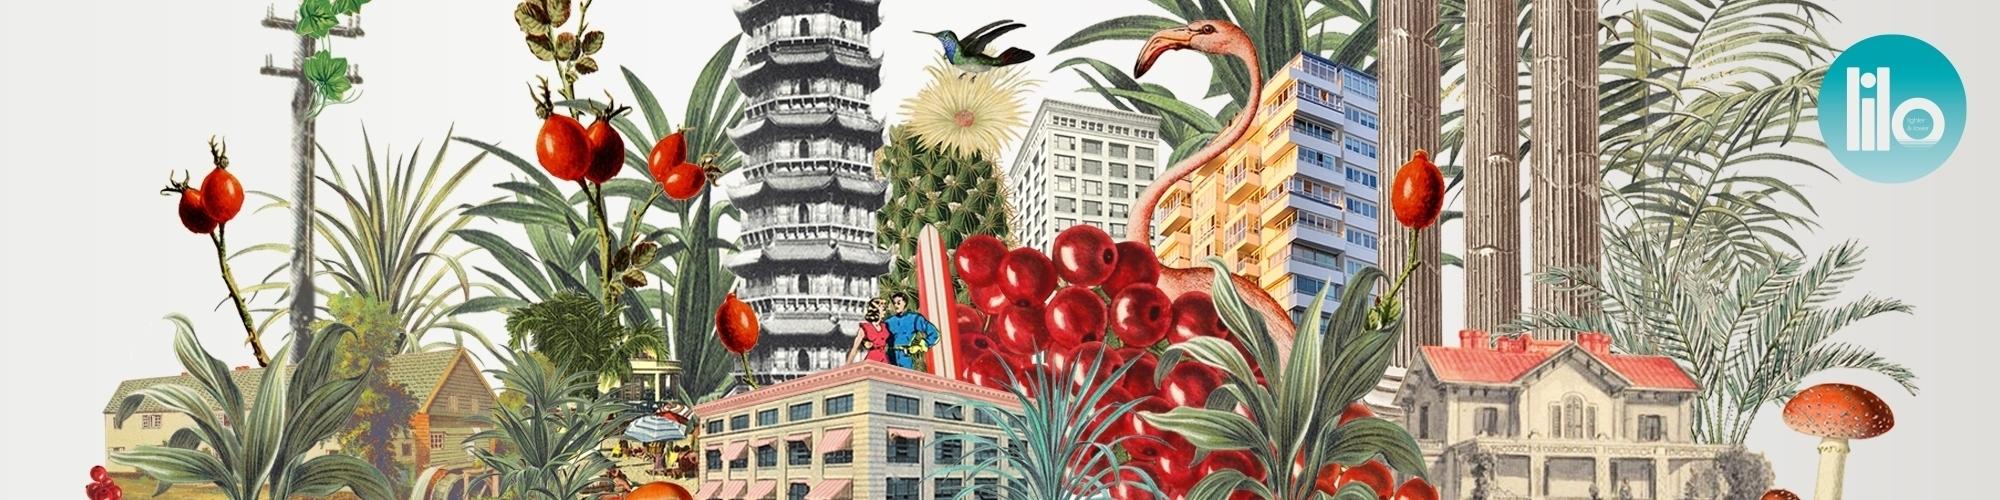 cityscape by Maria Rivans